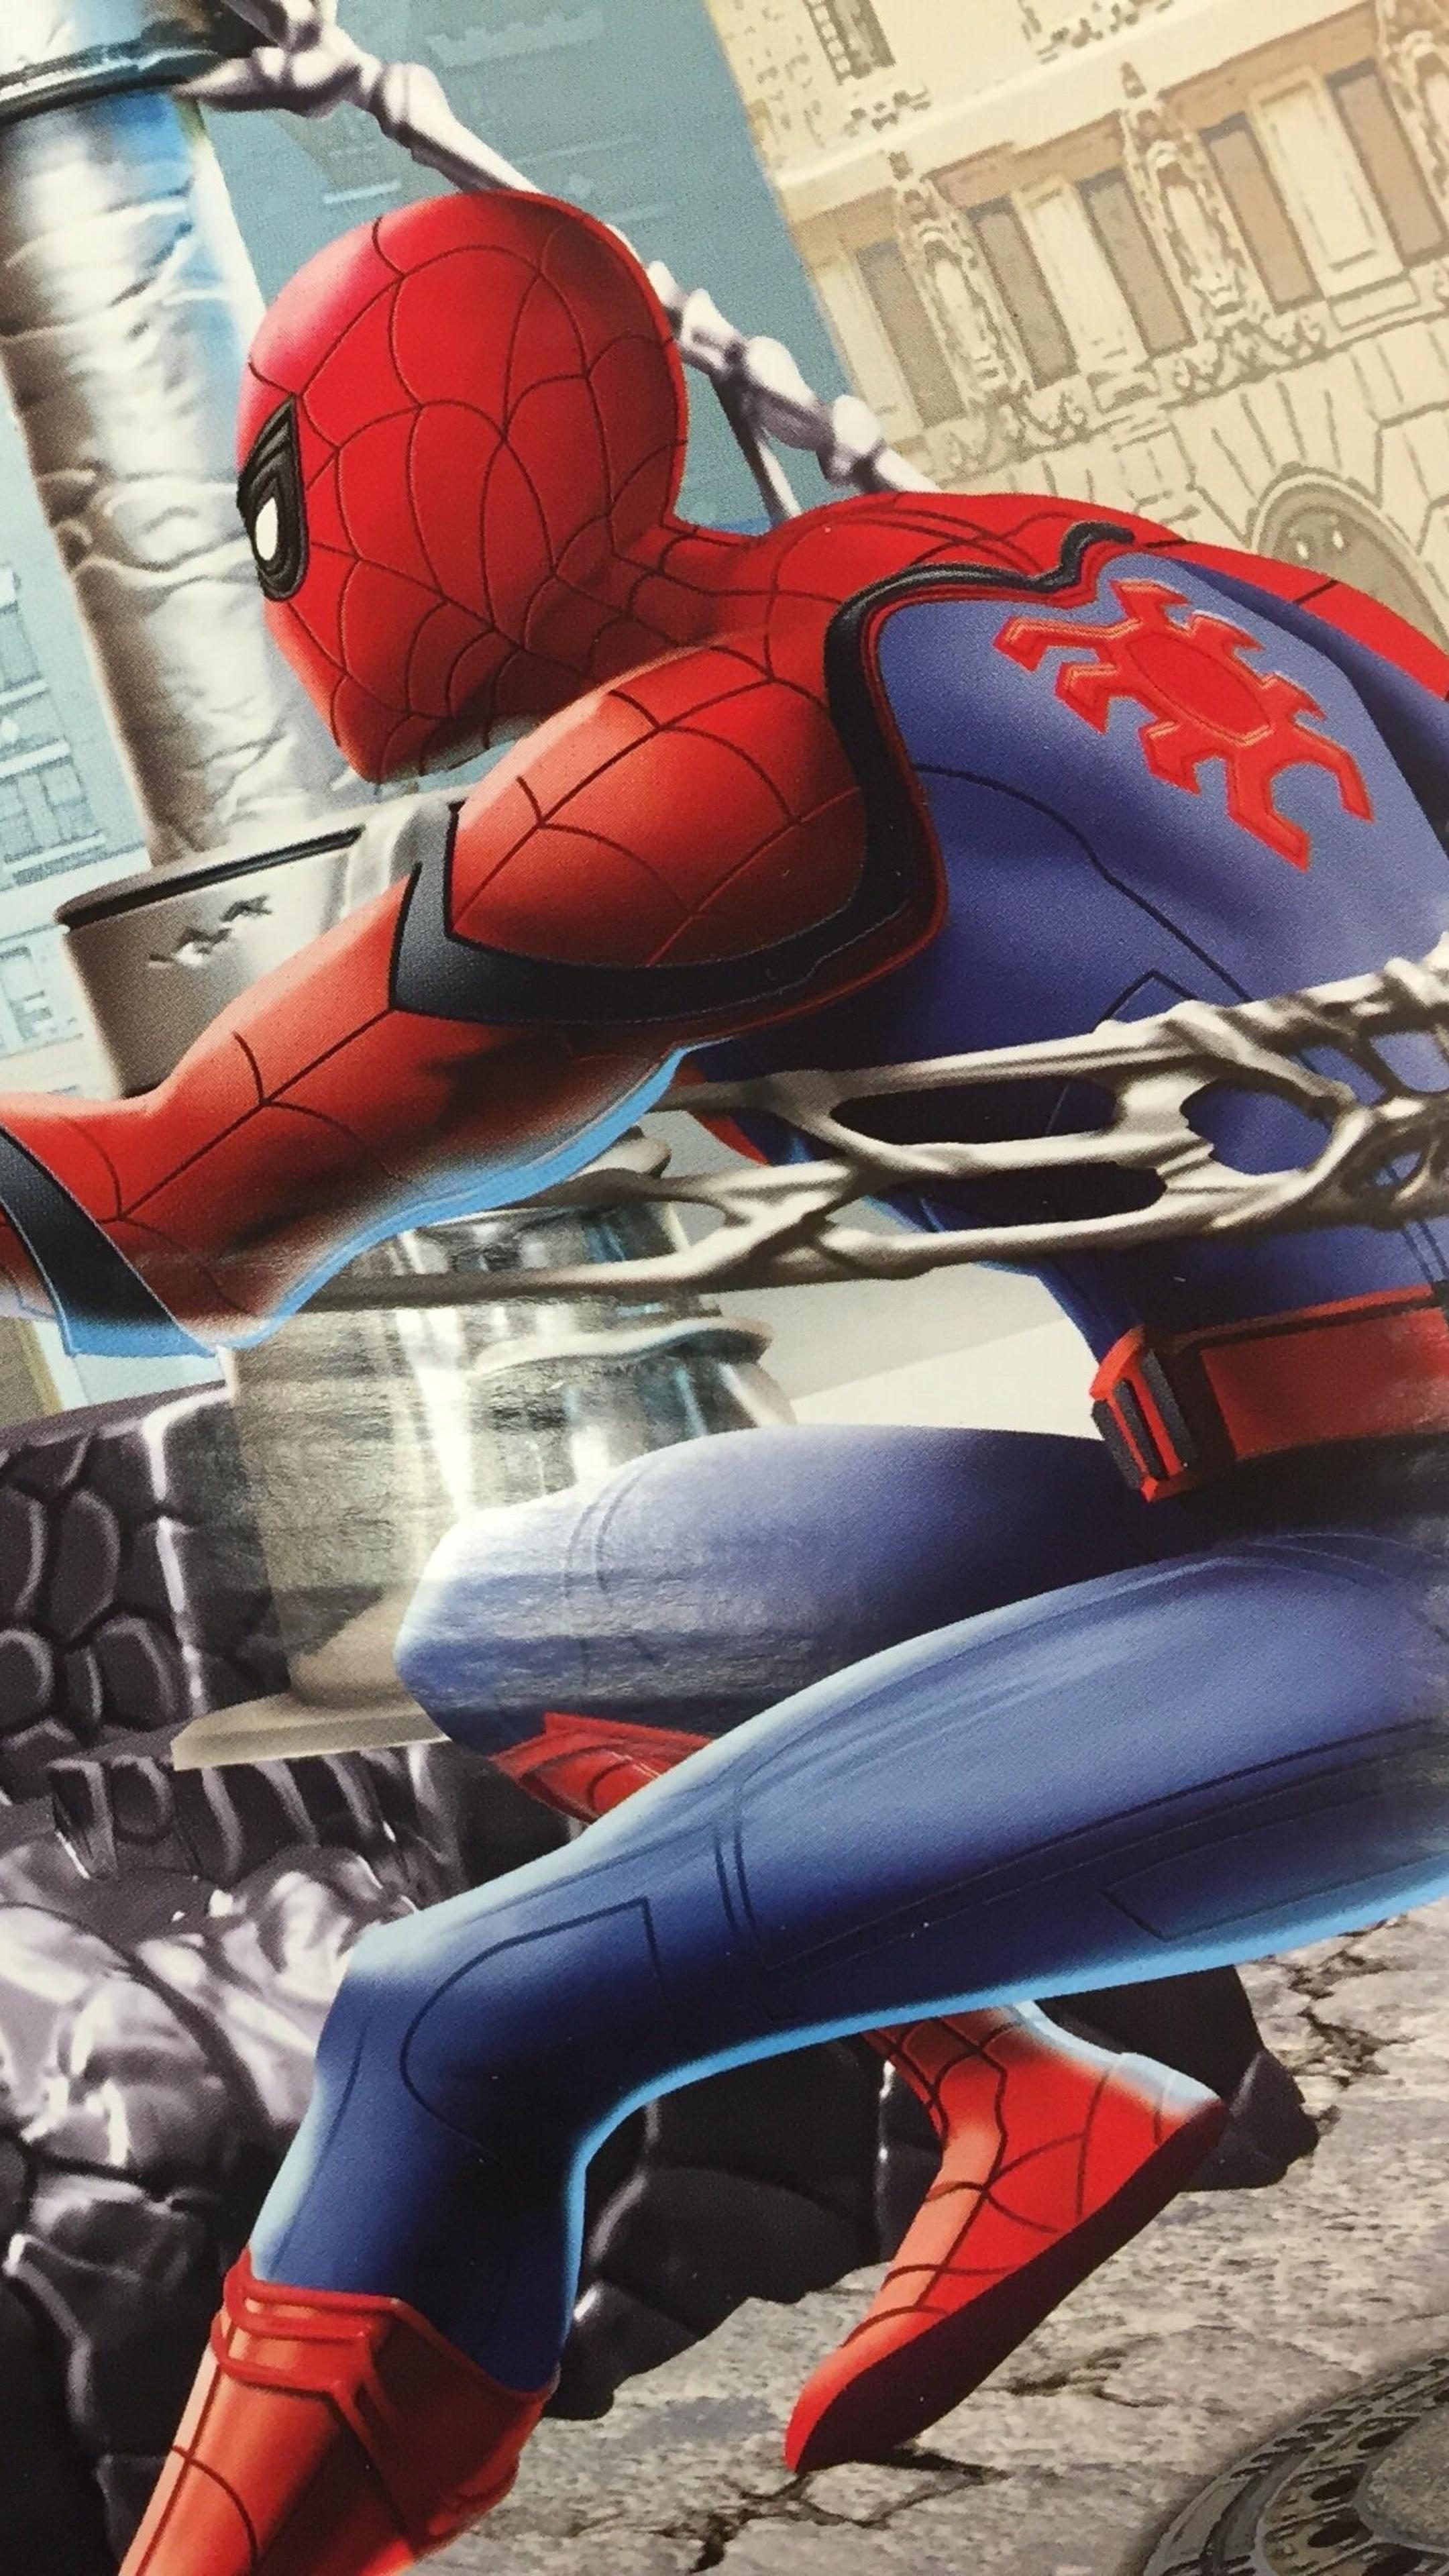 spiderman-homecoming-art-r9.jpg